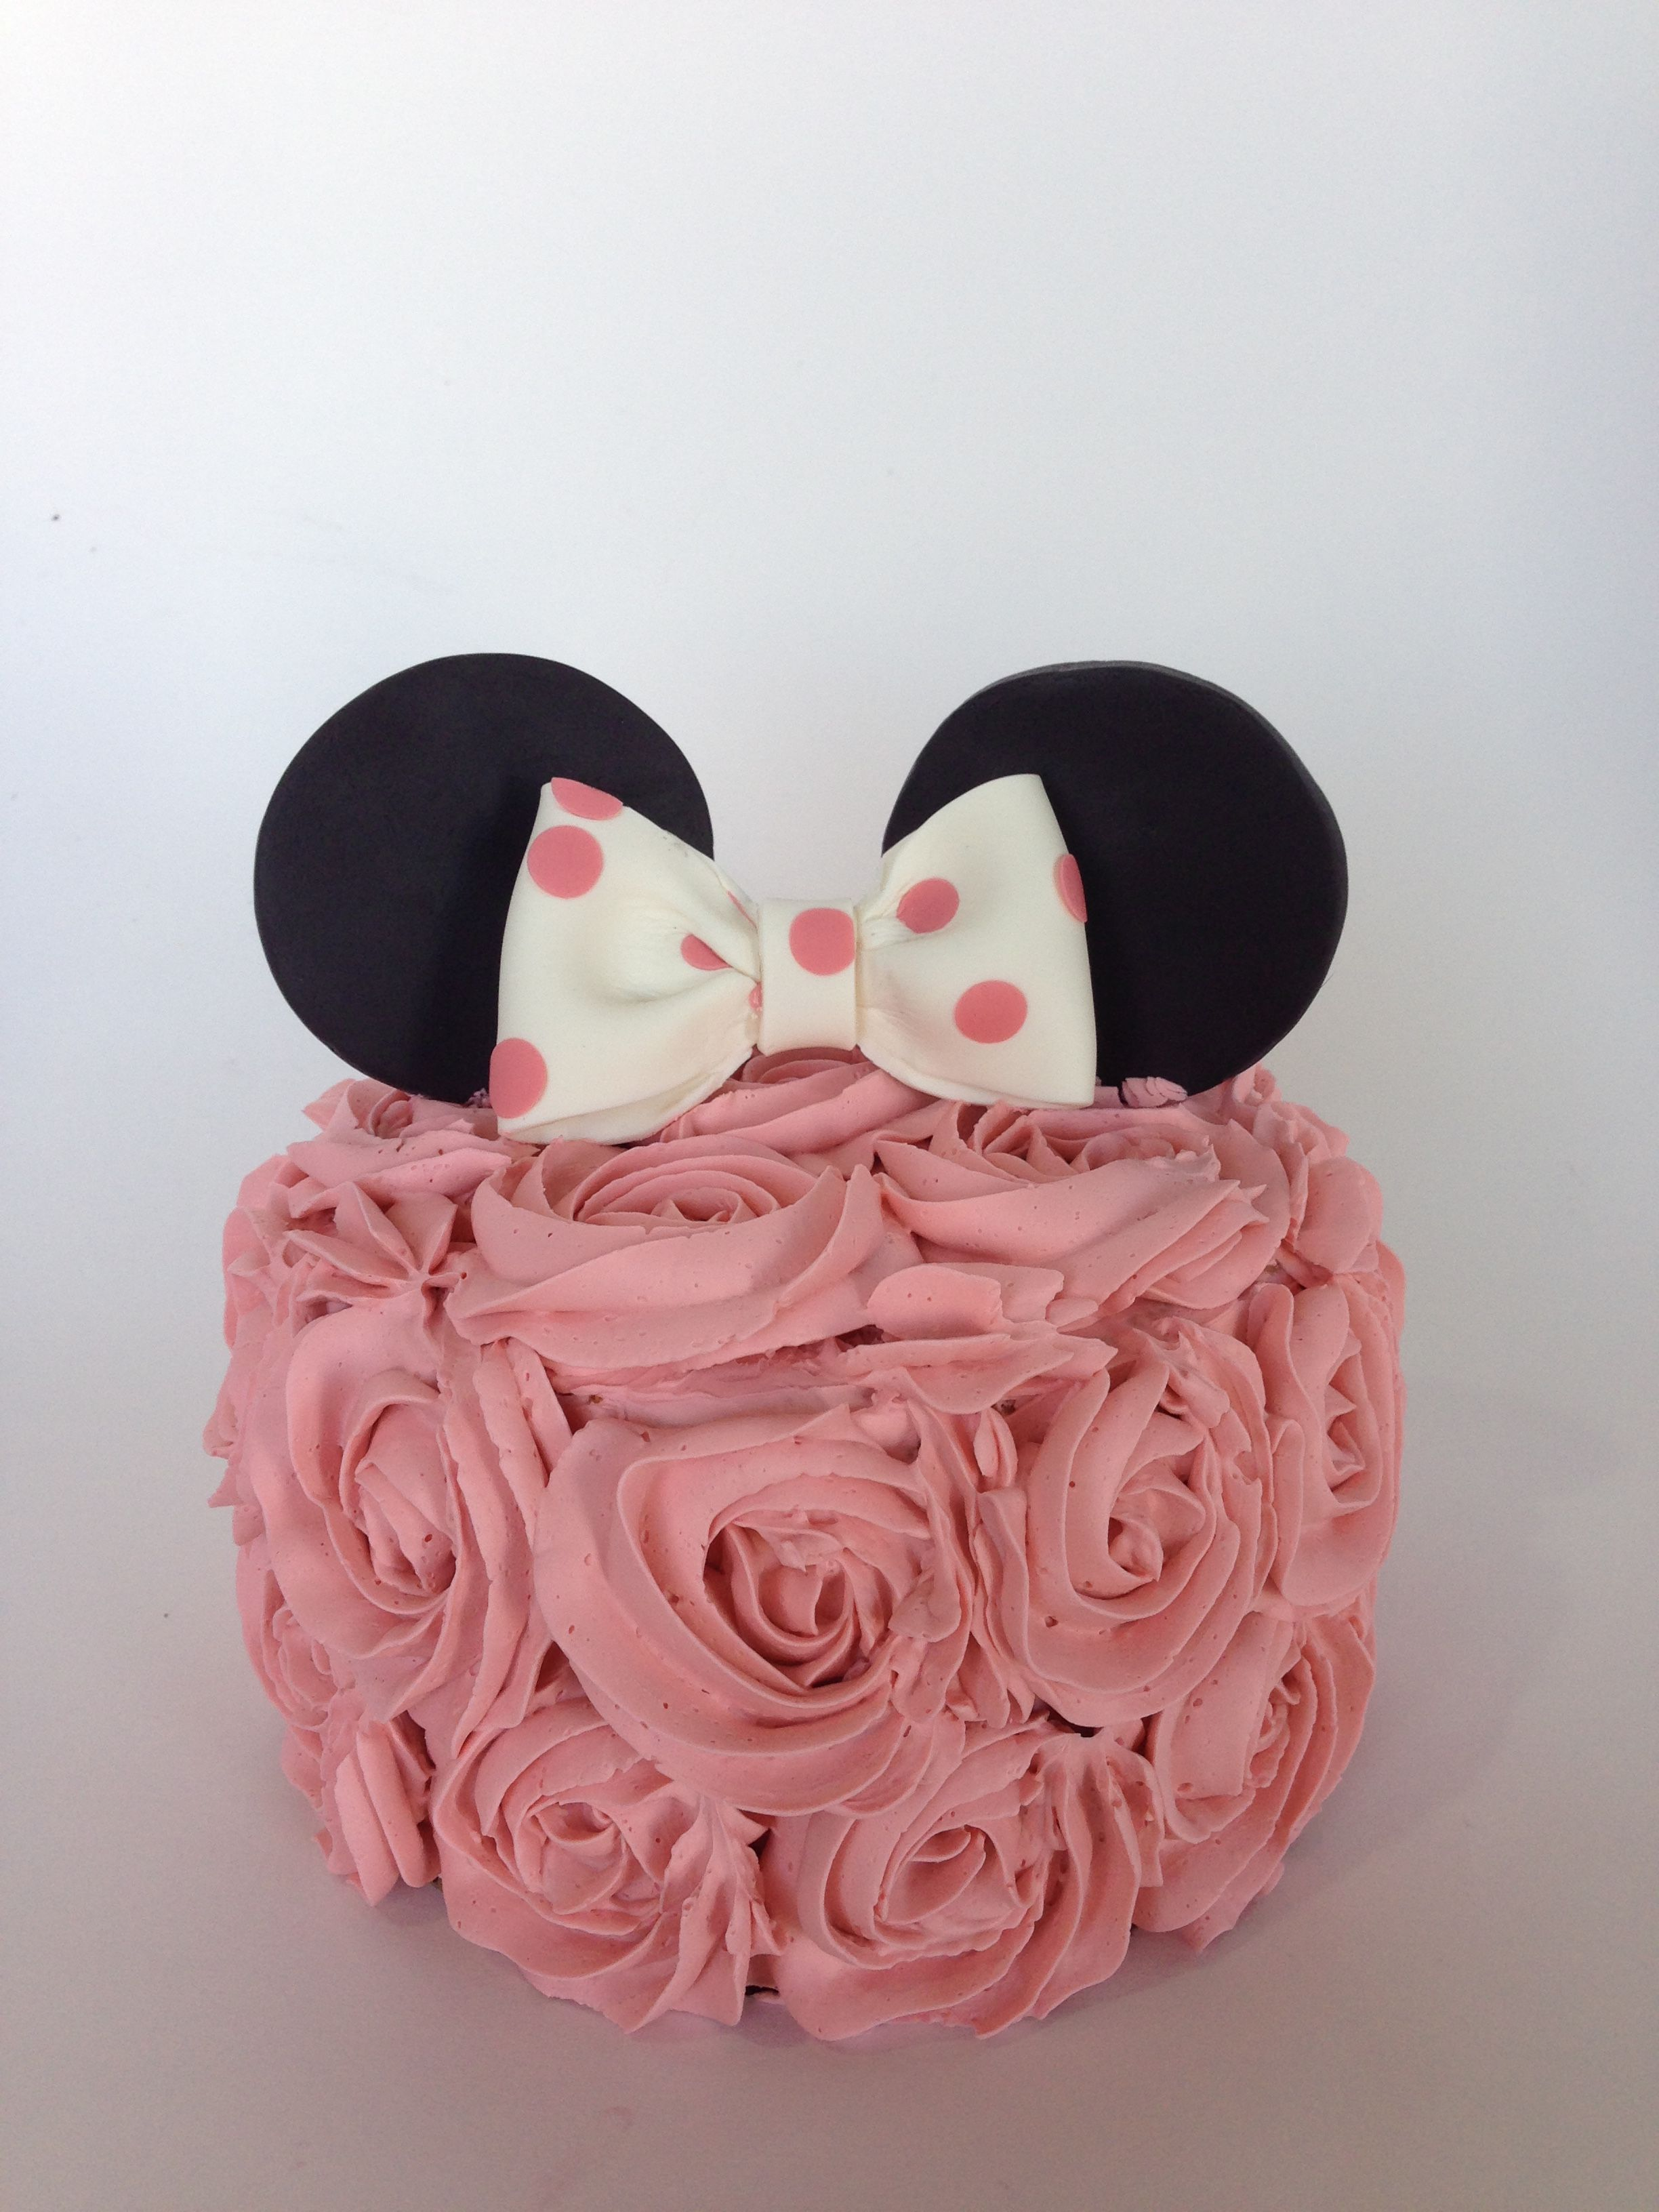 Minnie Mouse Smash Cake Pics | Bedwalls.co